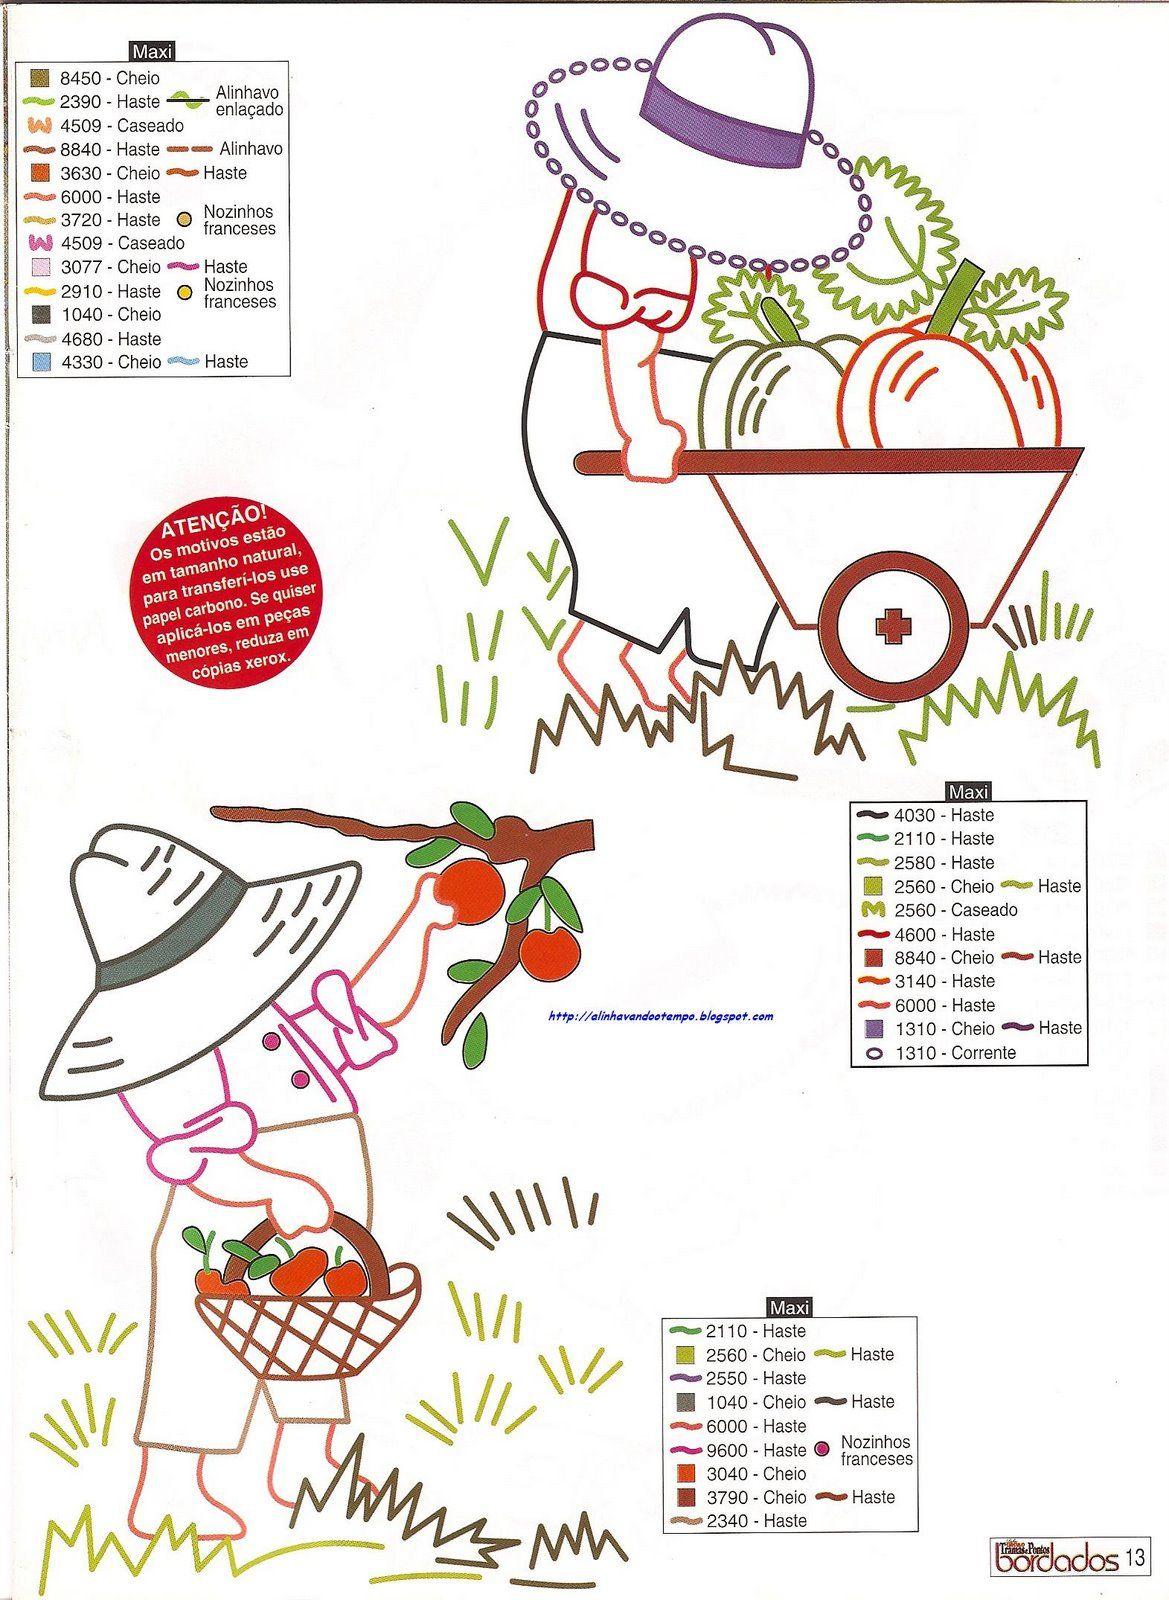 16.11-bl.1d-x.jpg] | Sun bonnet sue | Pinterest | Bordado, Lugares ...